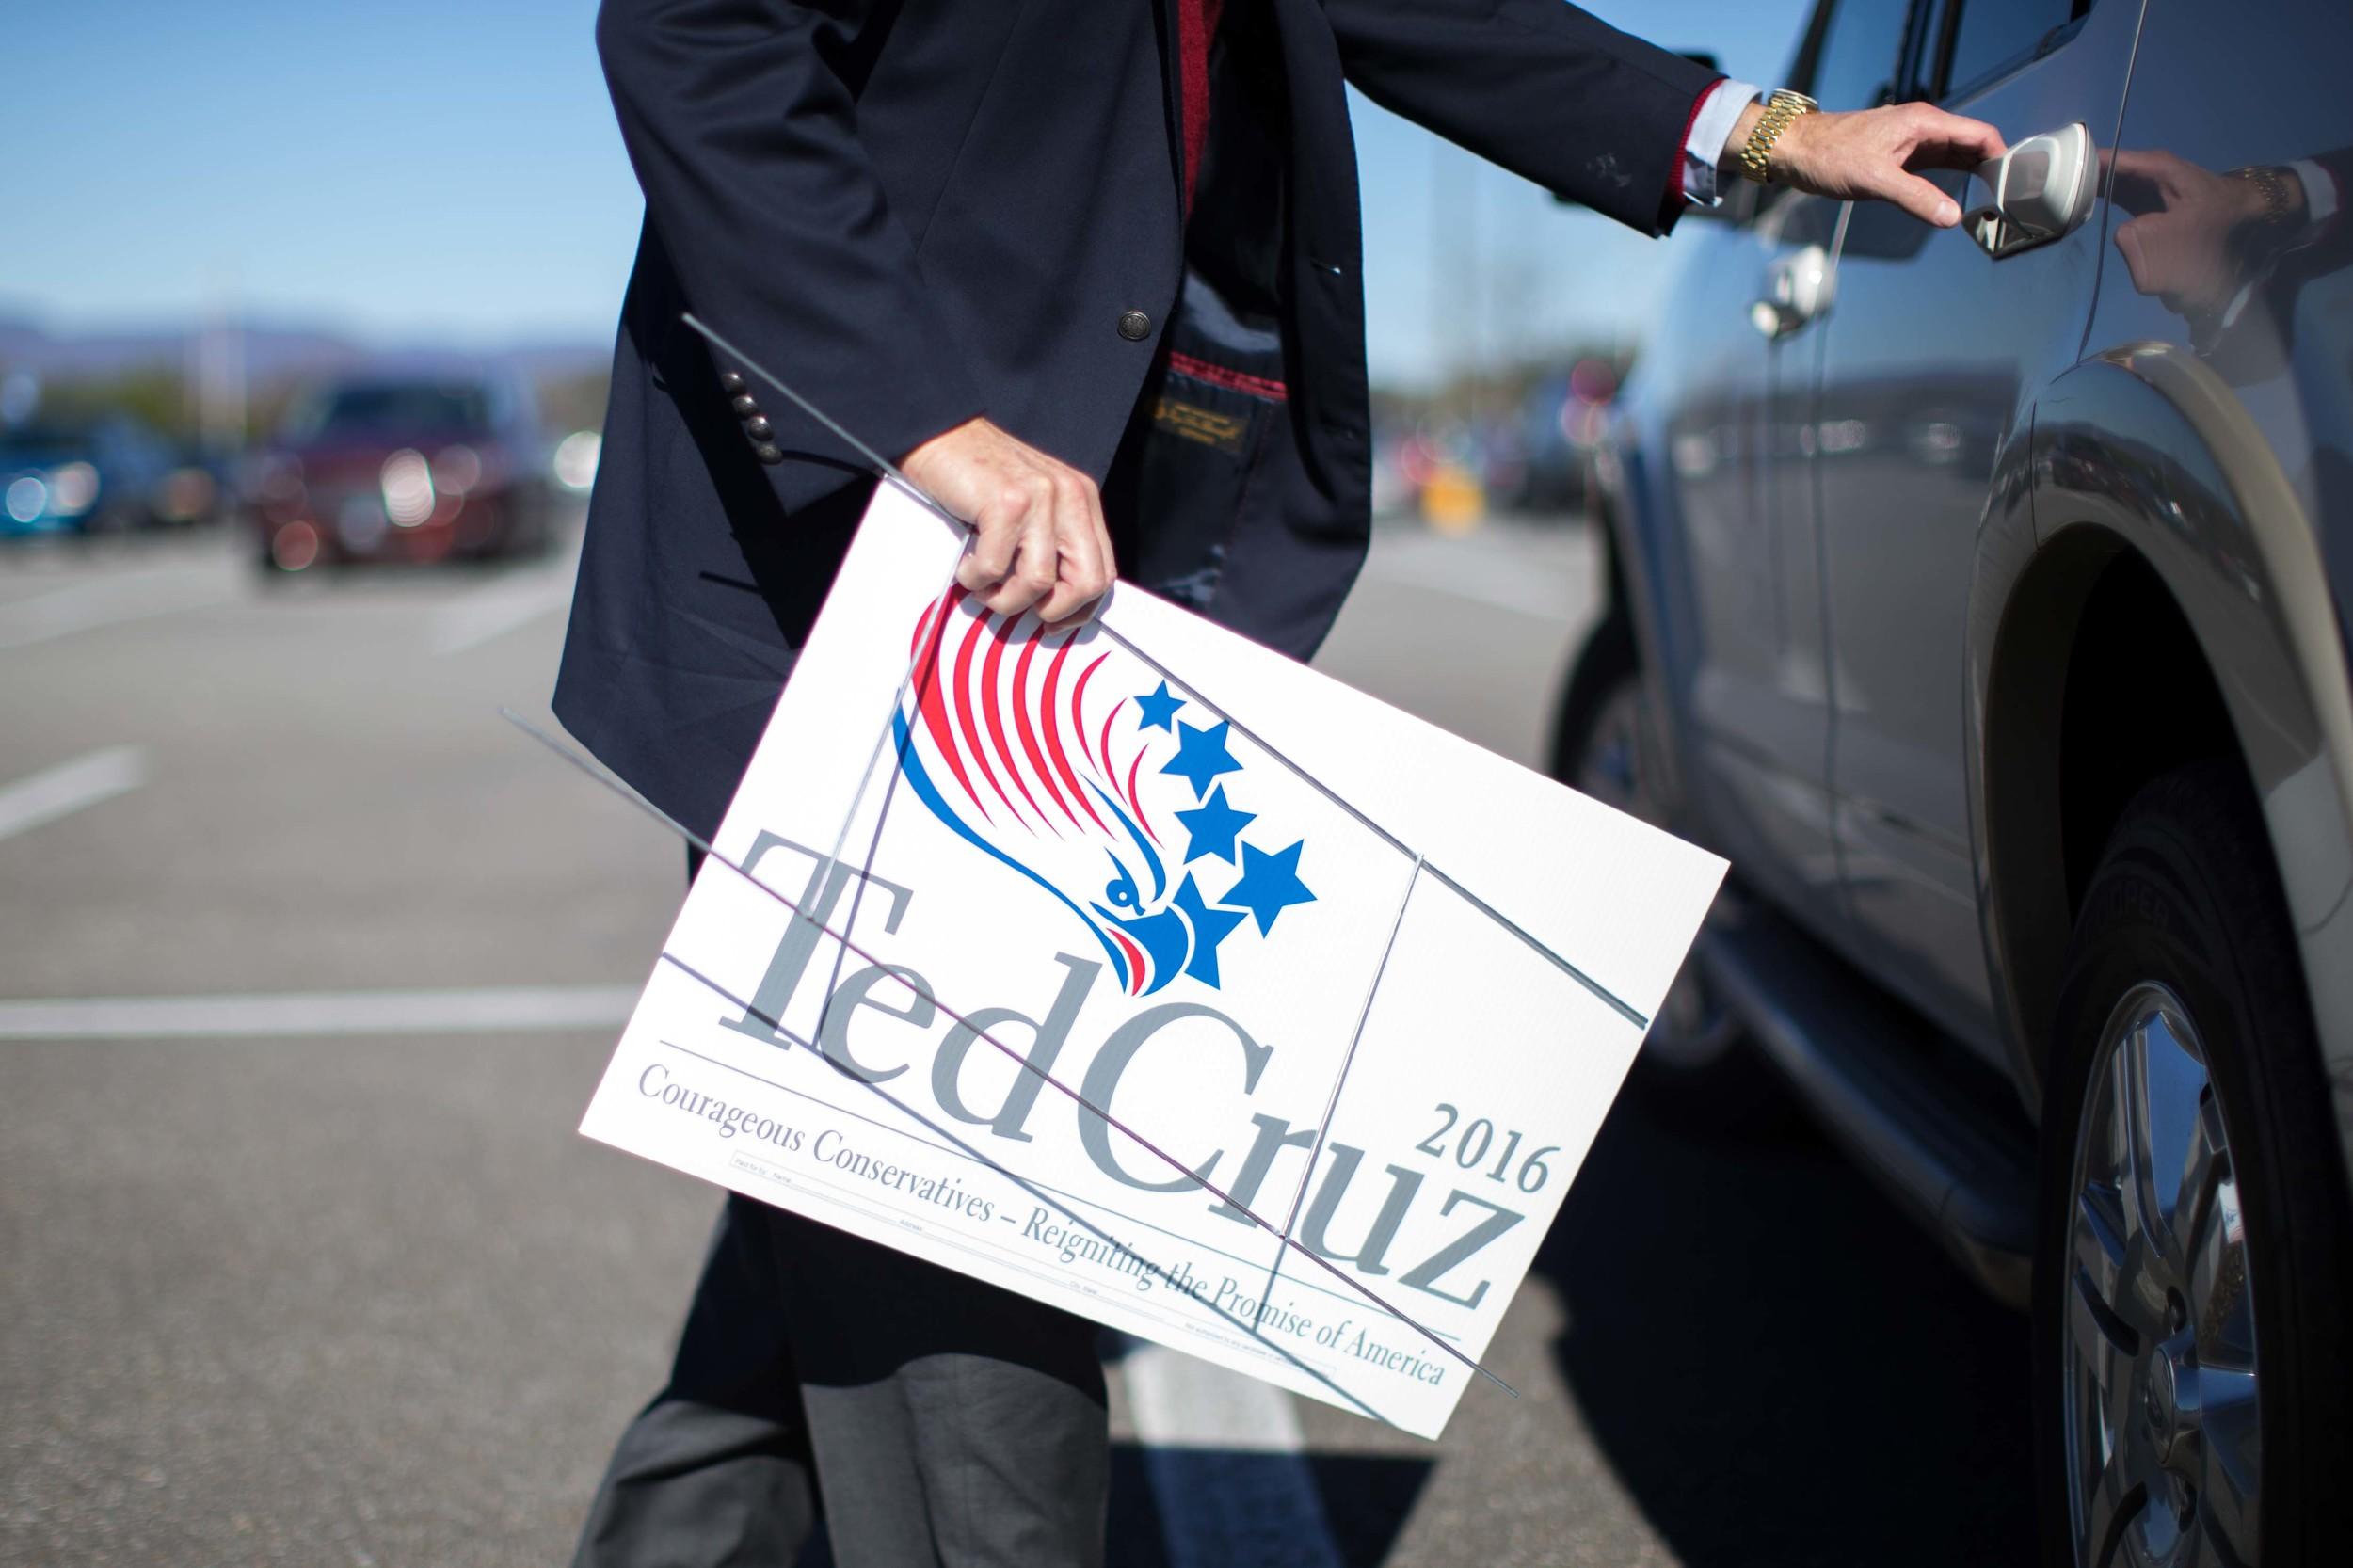 Joe McCutchen carries an election sign promoting Republican presidential candidate Ted Cruz, Saturday, Dec. 5, 2015, in Ellijay, Ga. BRANDEN CAMP FOR THE BOSTON GLOBE